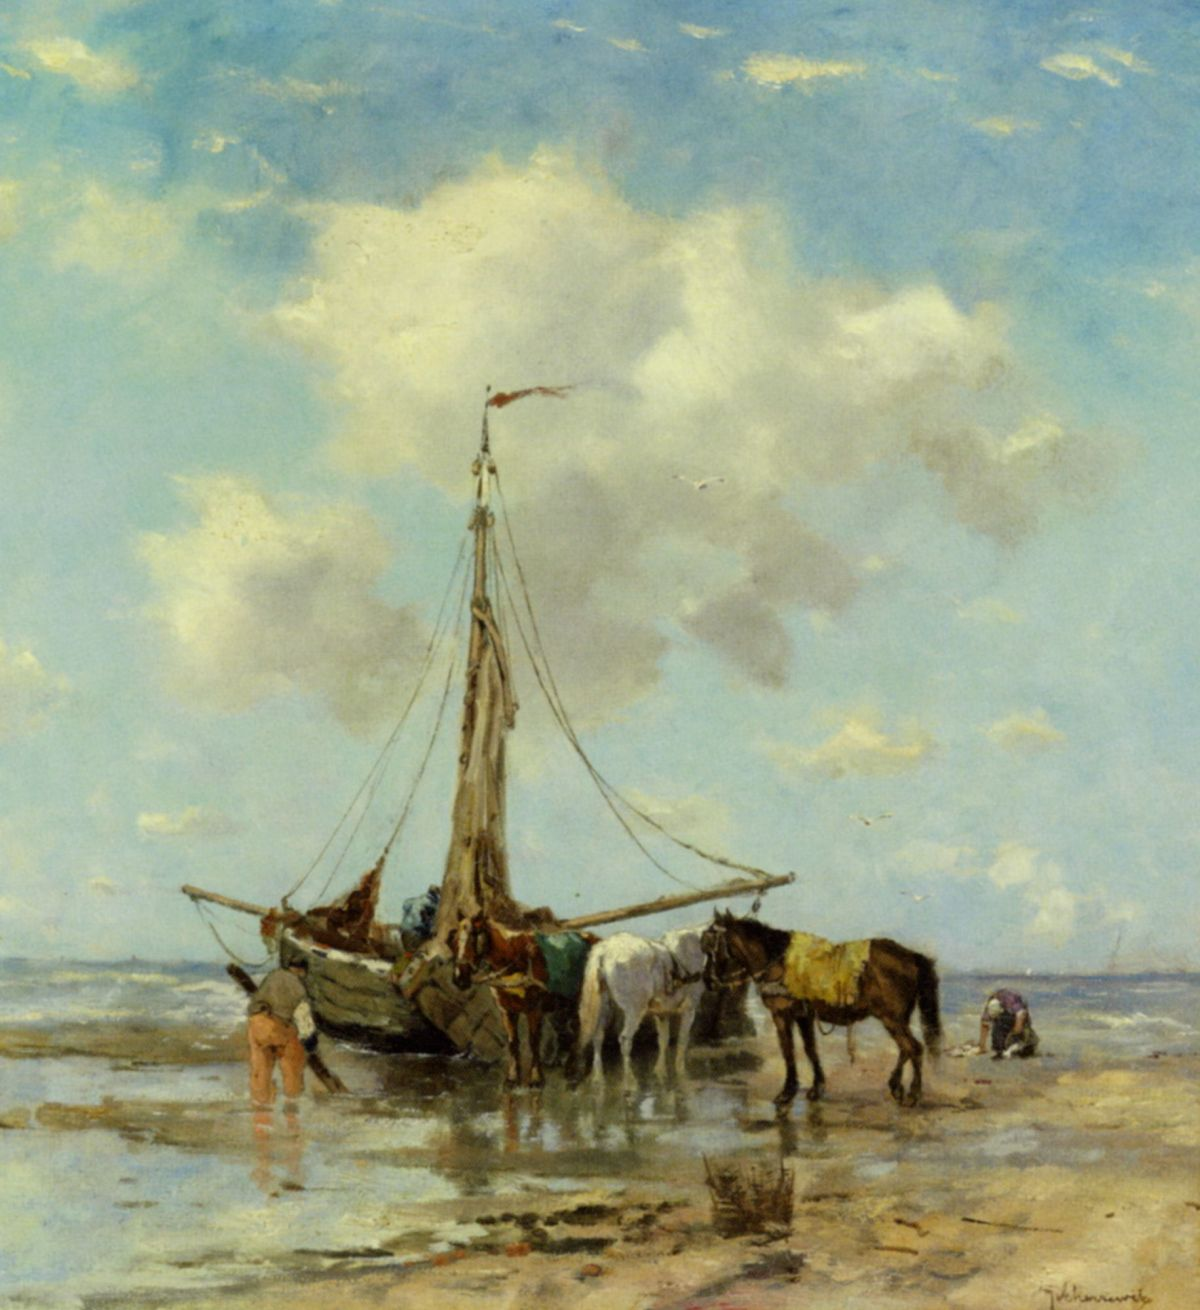 Shellfishers at Low Tide by Johan Frederik Cornelis Scherrewitz